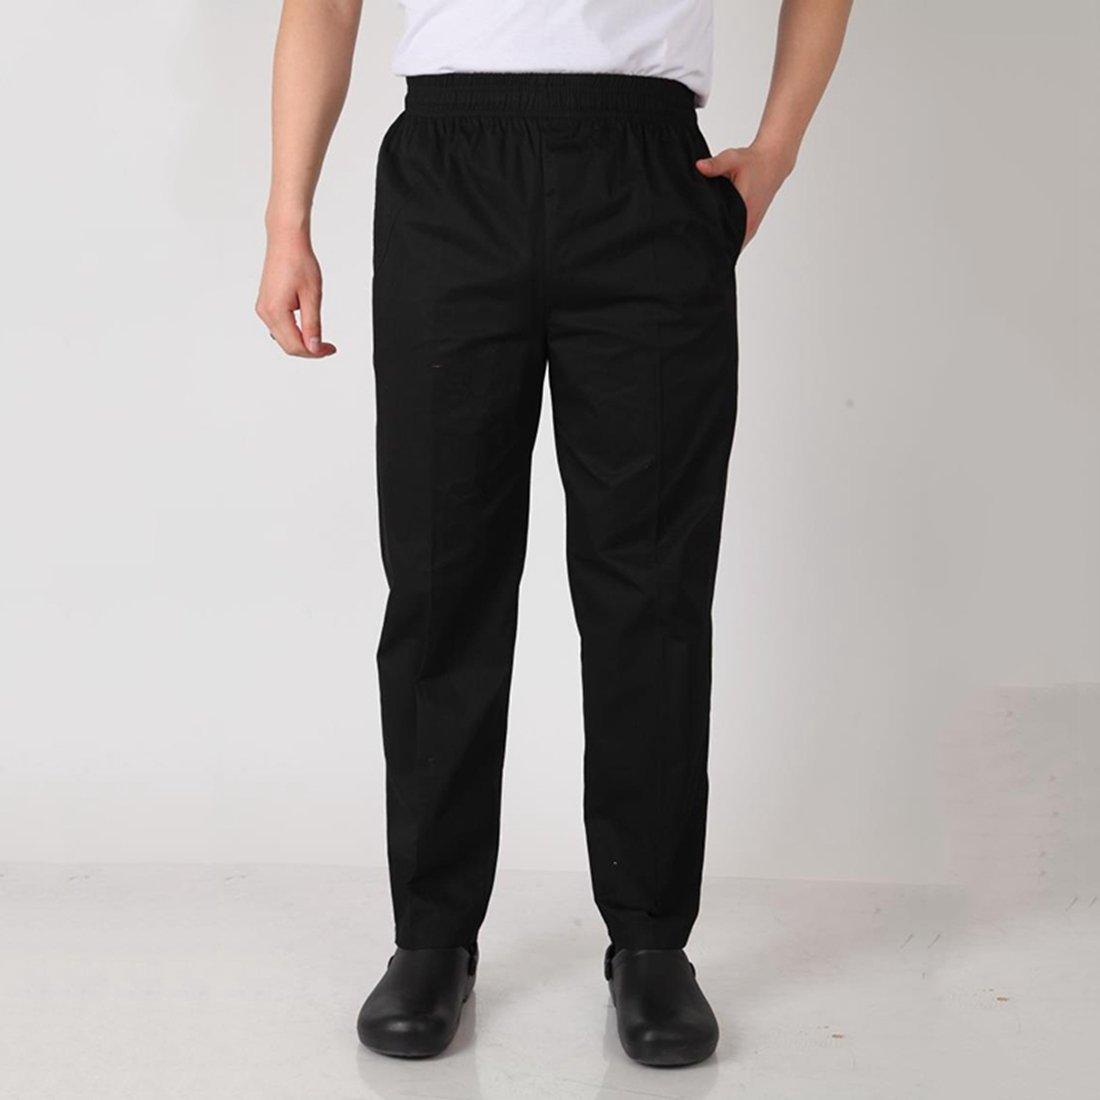 Enerhu Men Elastic Waist Baggy Chef Pants Pockets Hotel/Kitchen/Restaurant/Coffee Uniform Pants Asian M by Enerhu (Image #5)